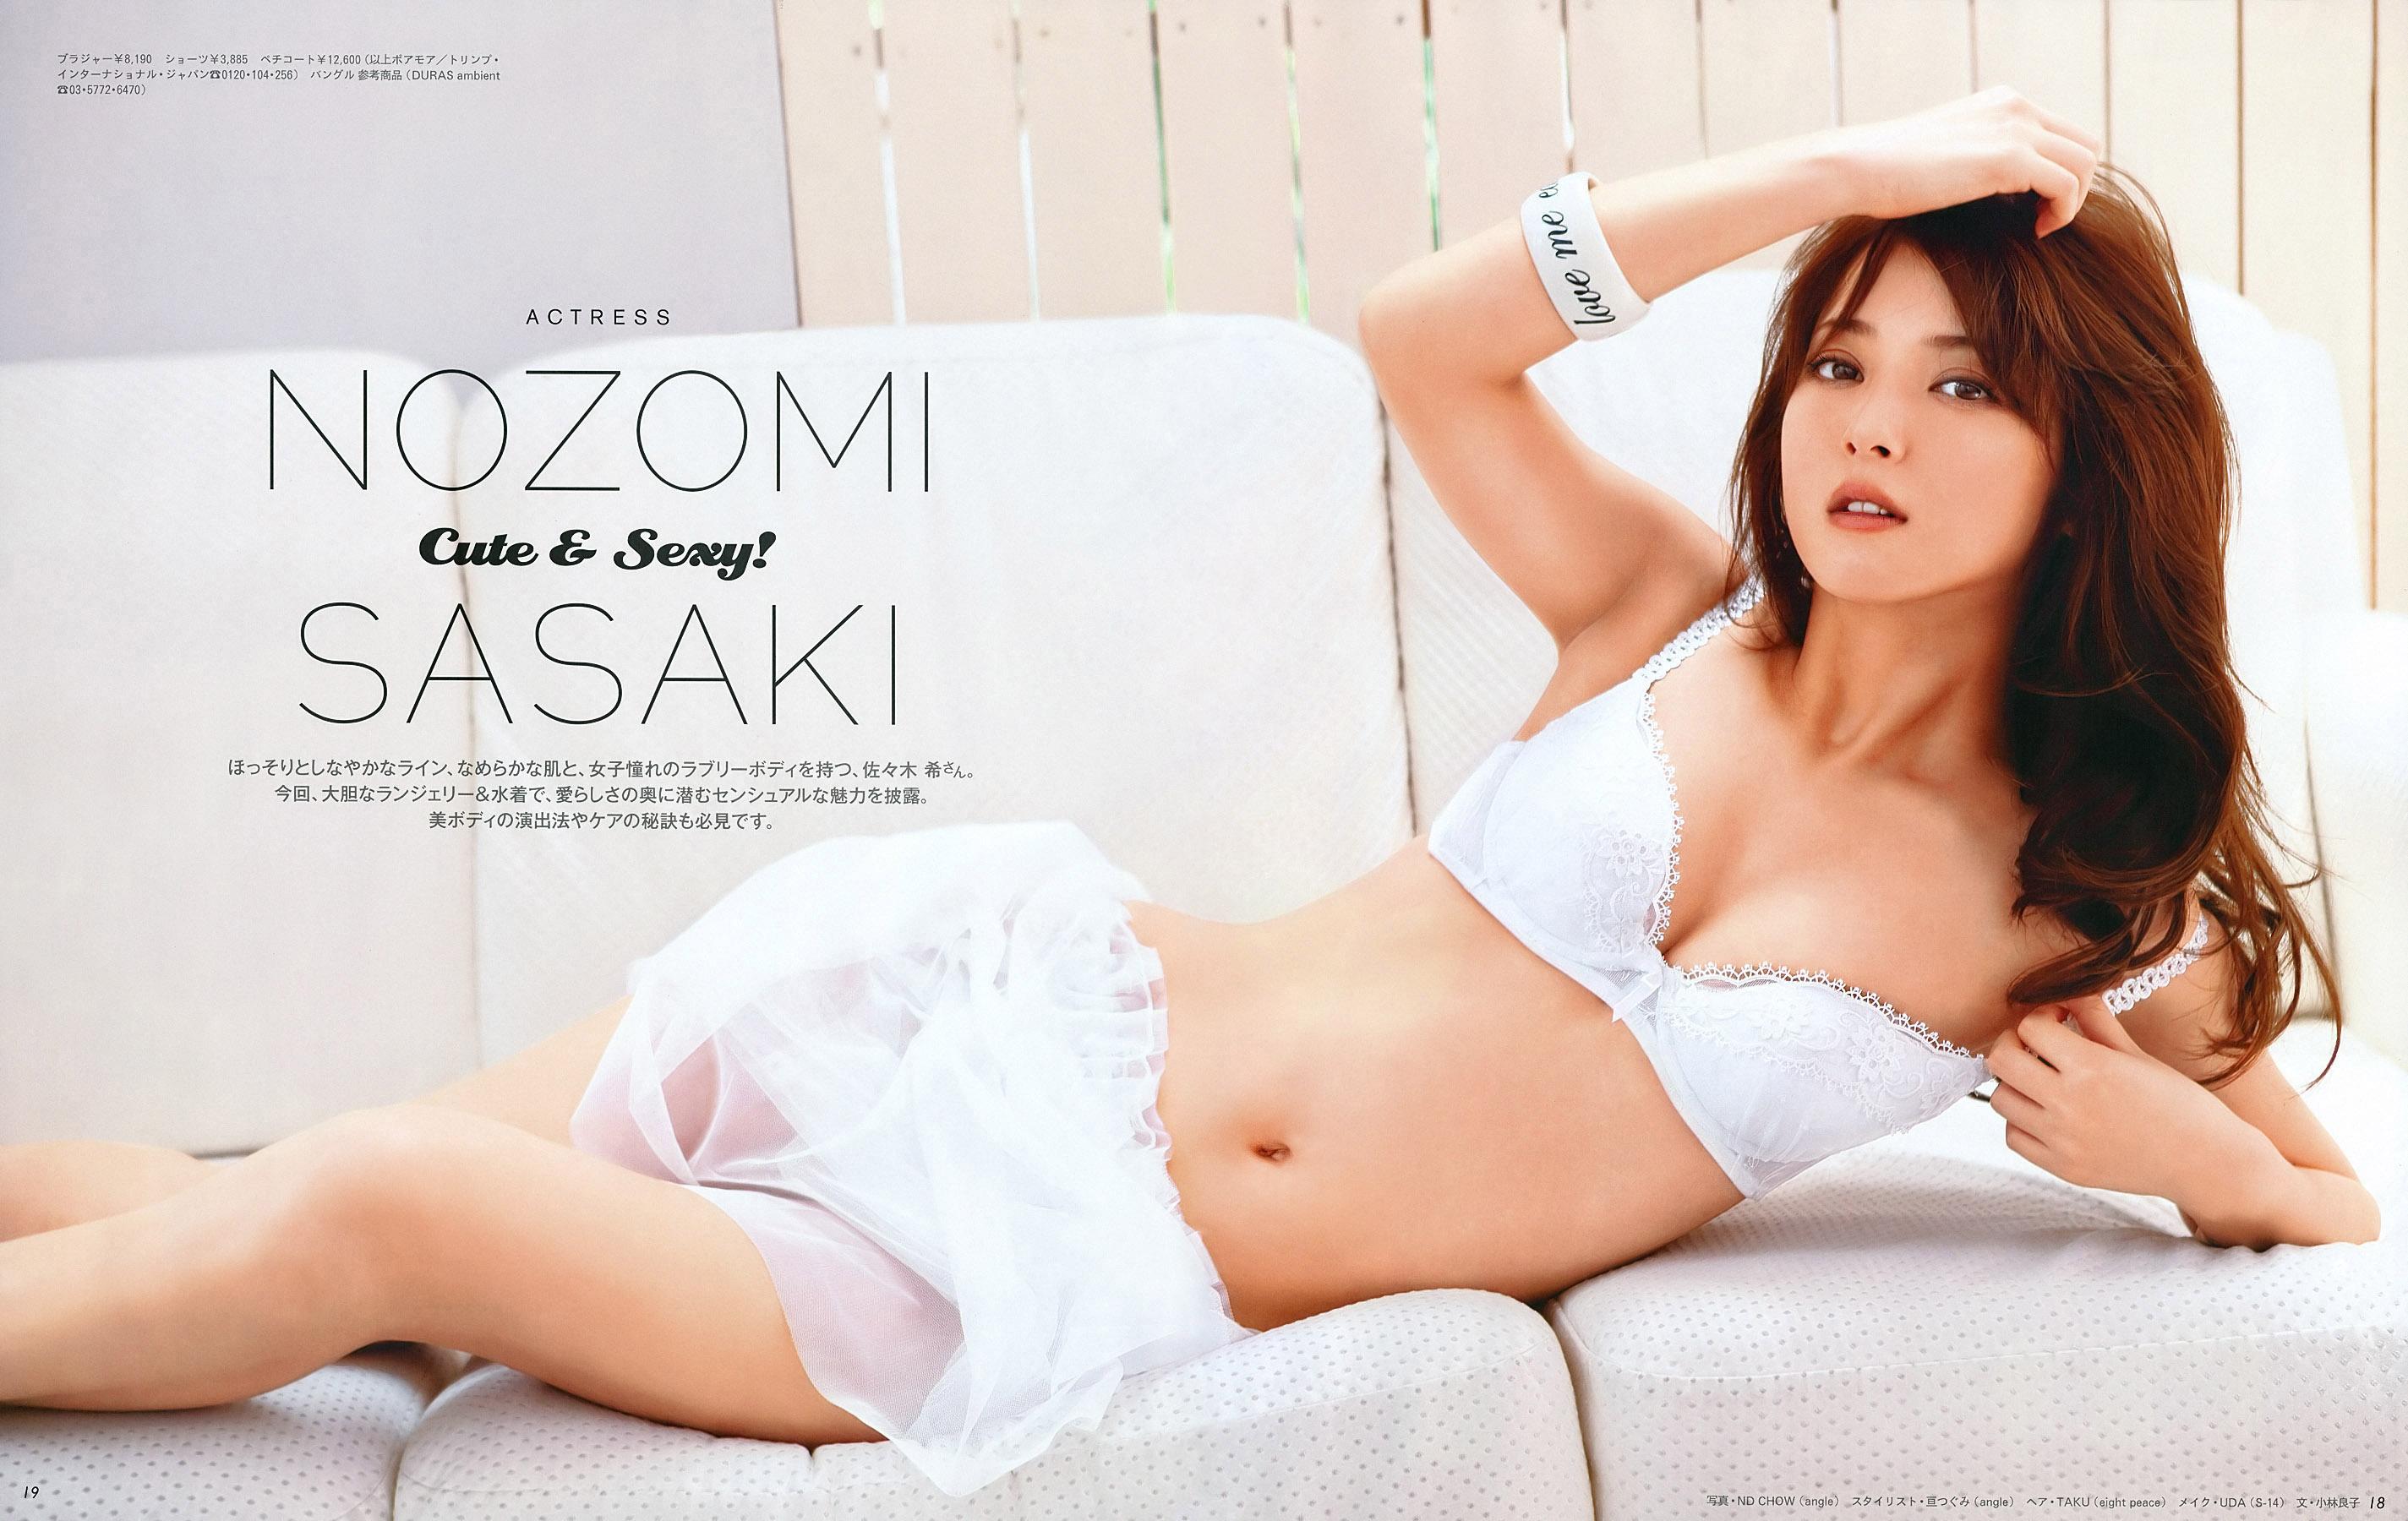 Are mistaken. Nozomi sasaki asian school girl pity